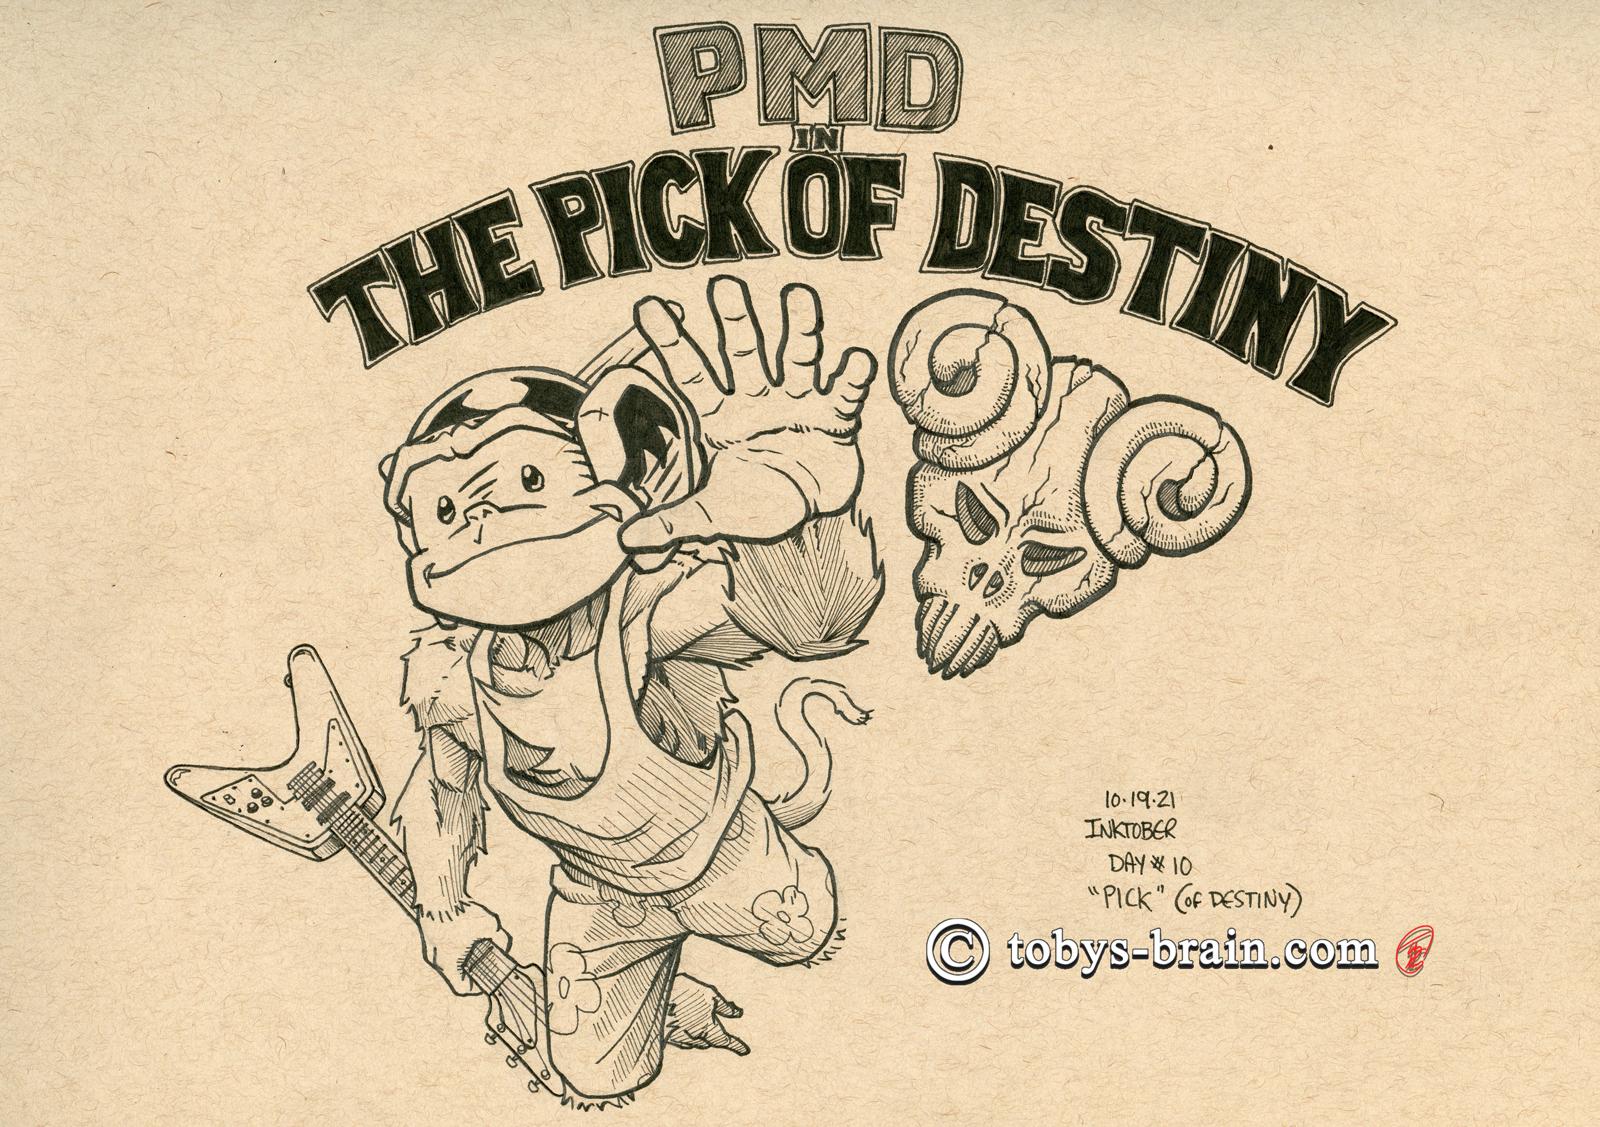 Inktober 2021 Day #10: Pick (of Destiny)